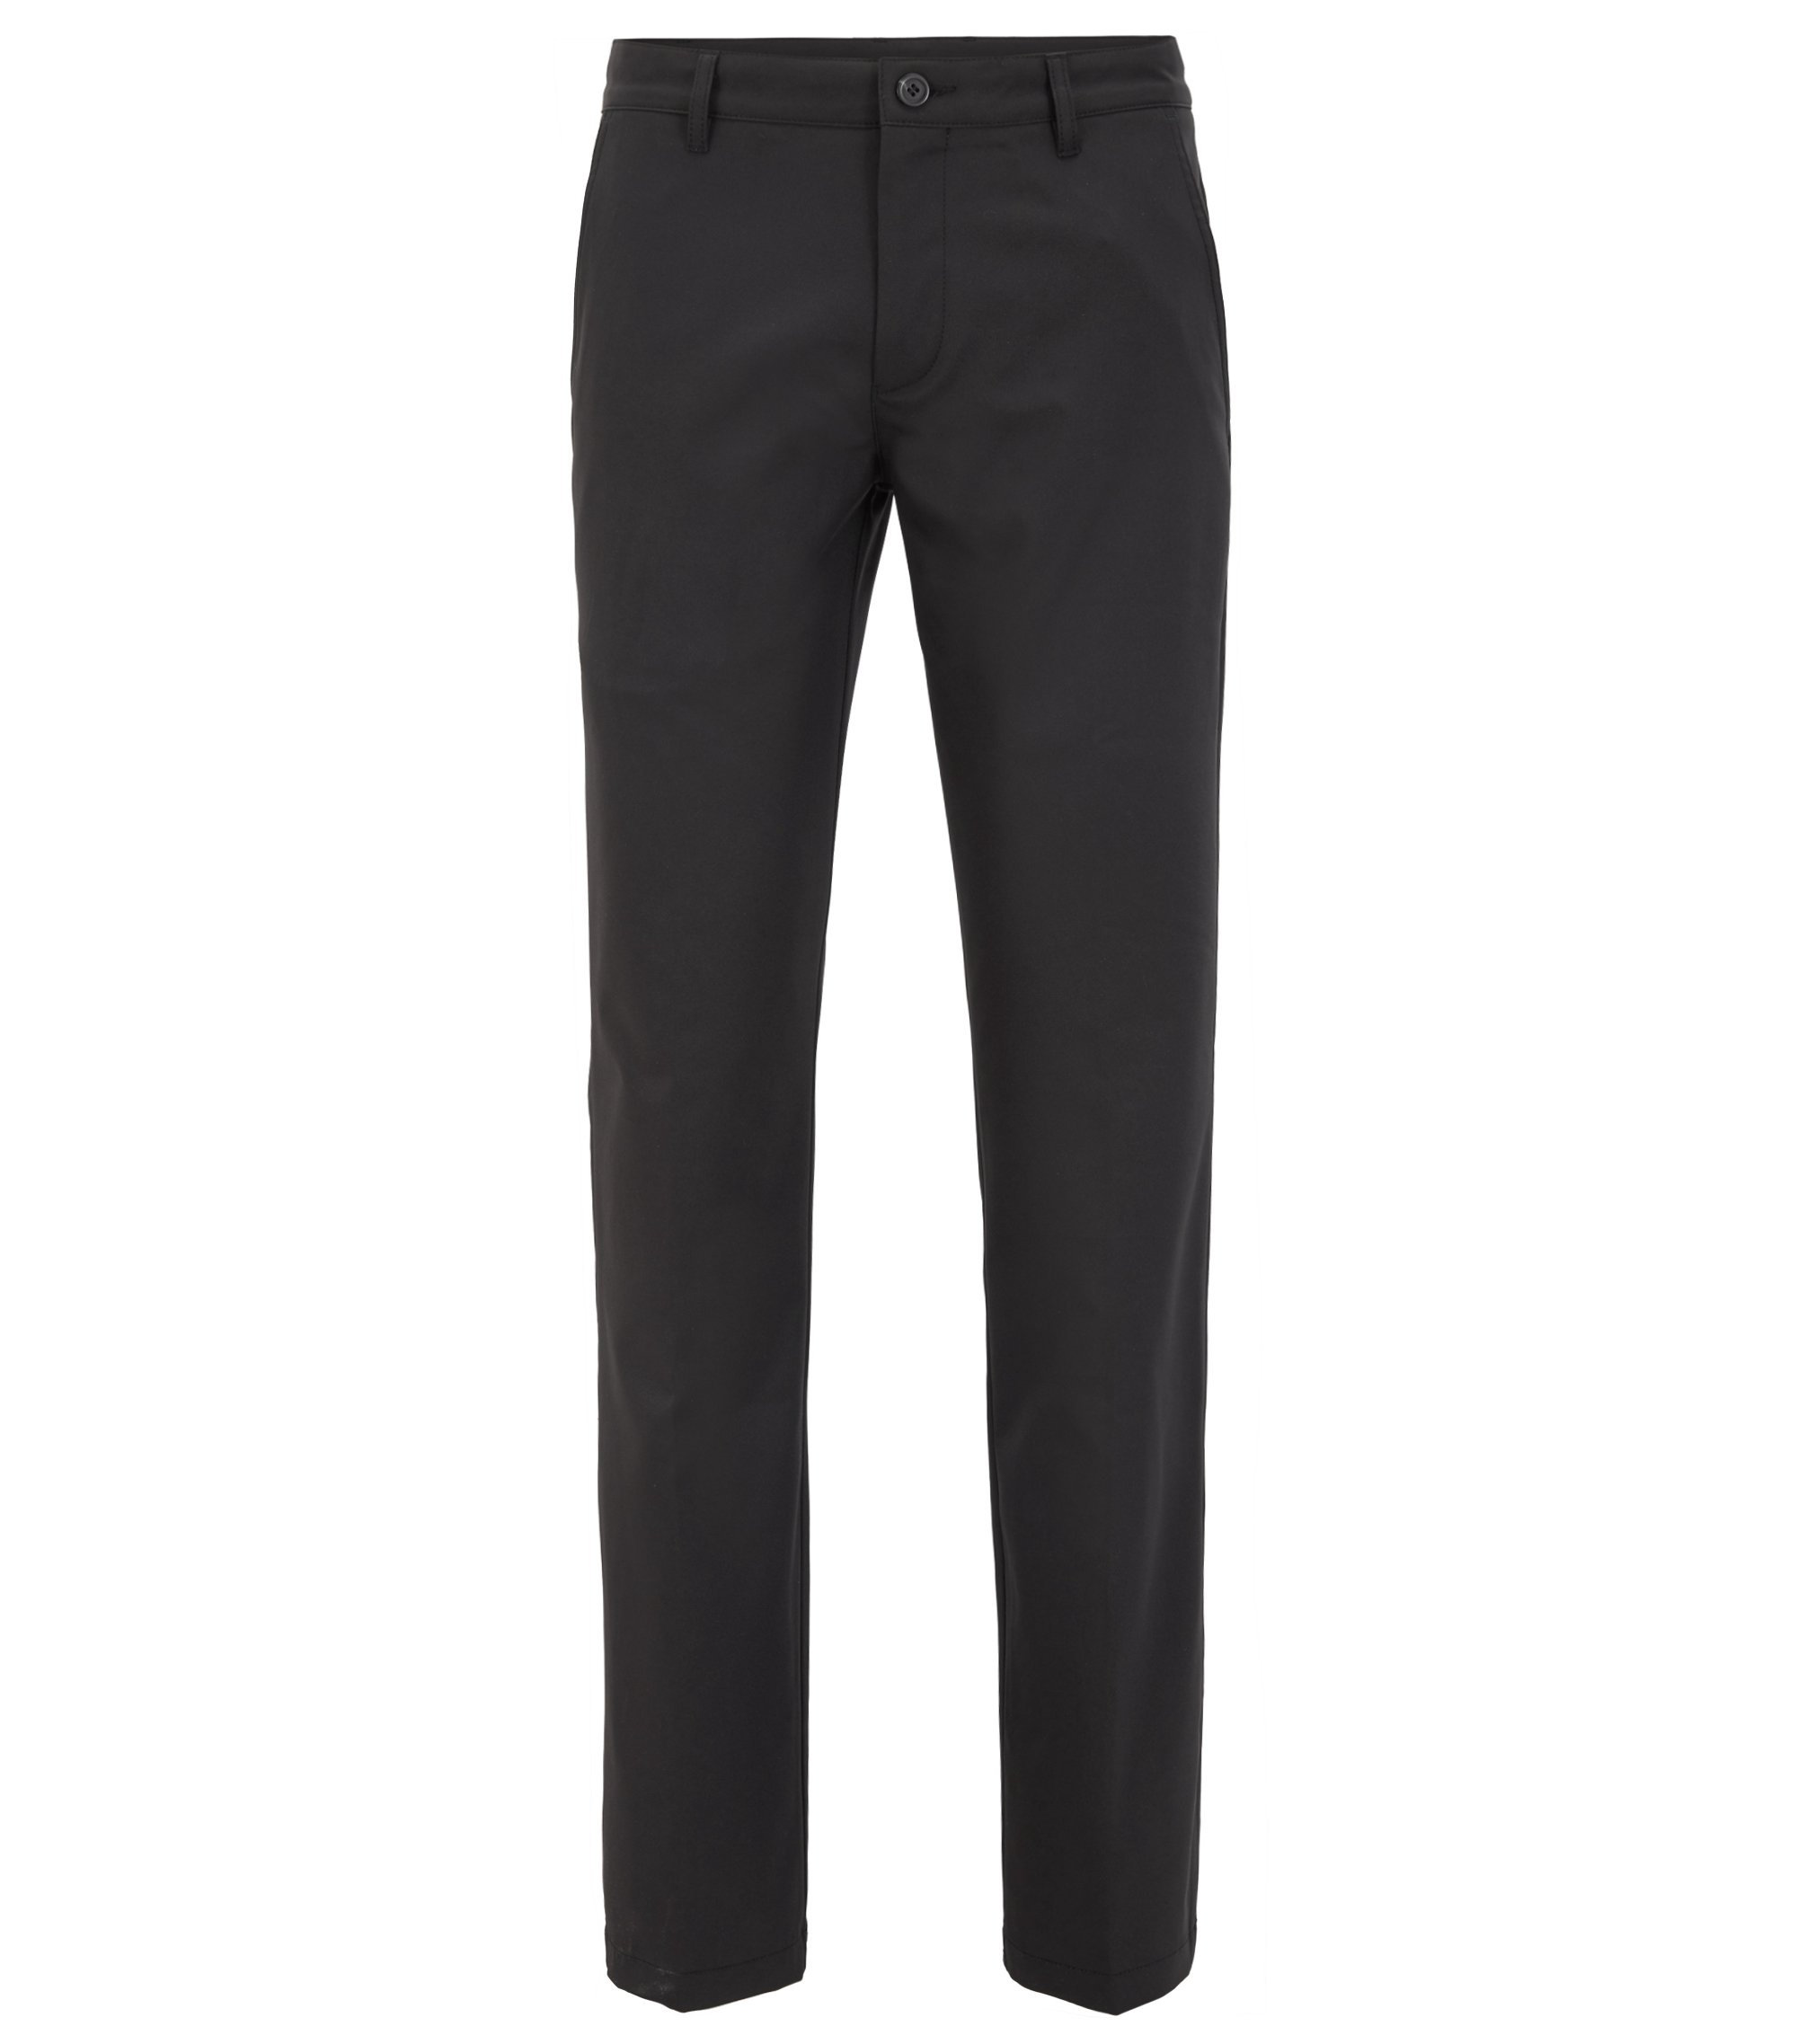 CoolMax Performance Golf Pant, Slim Fit | Hakan , Black